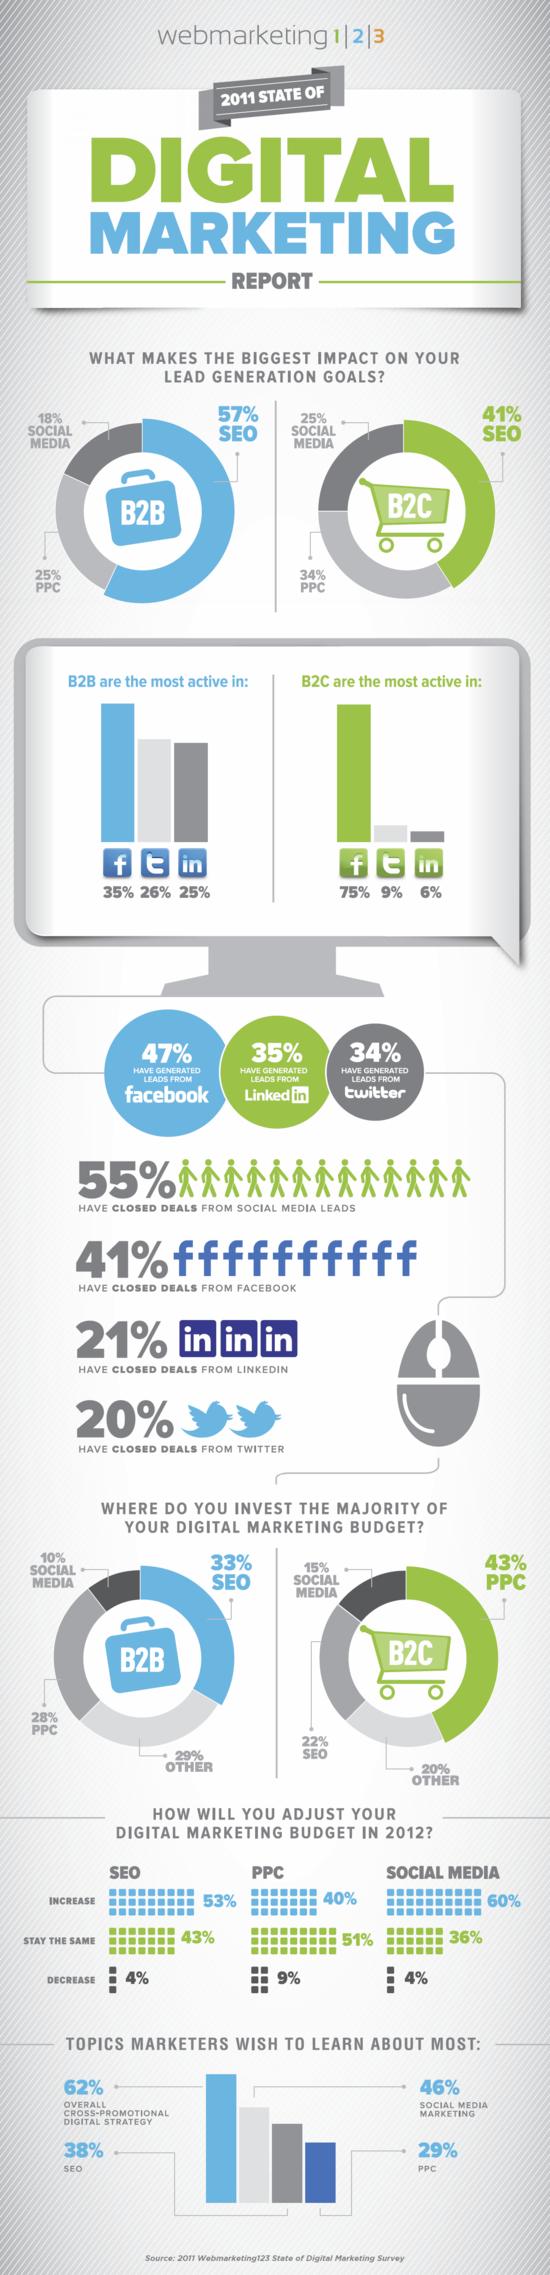 INFOGRAPHIC - 2011 State of Digital Marketing Report - Webmarketing 123 - Q3 2011